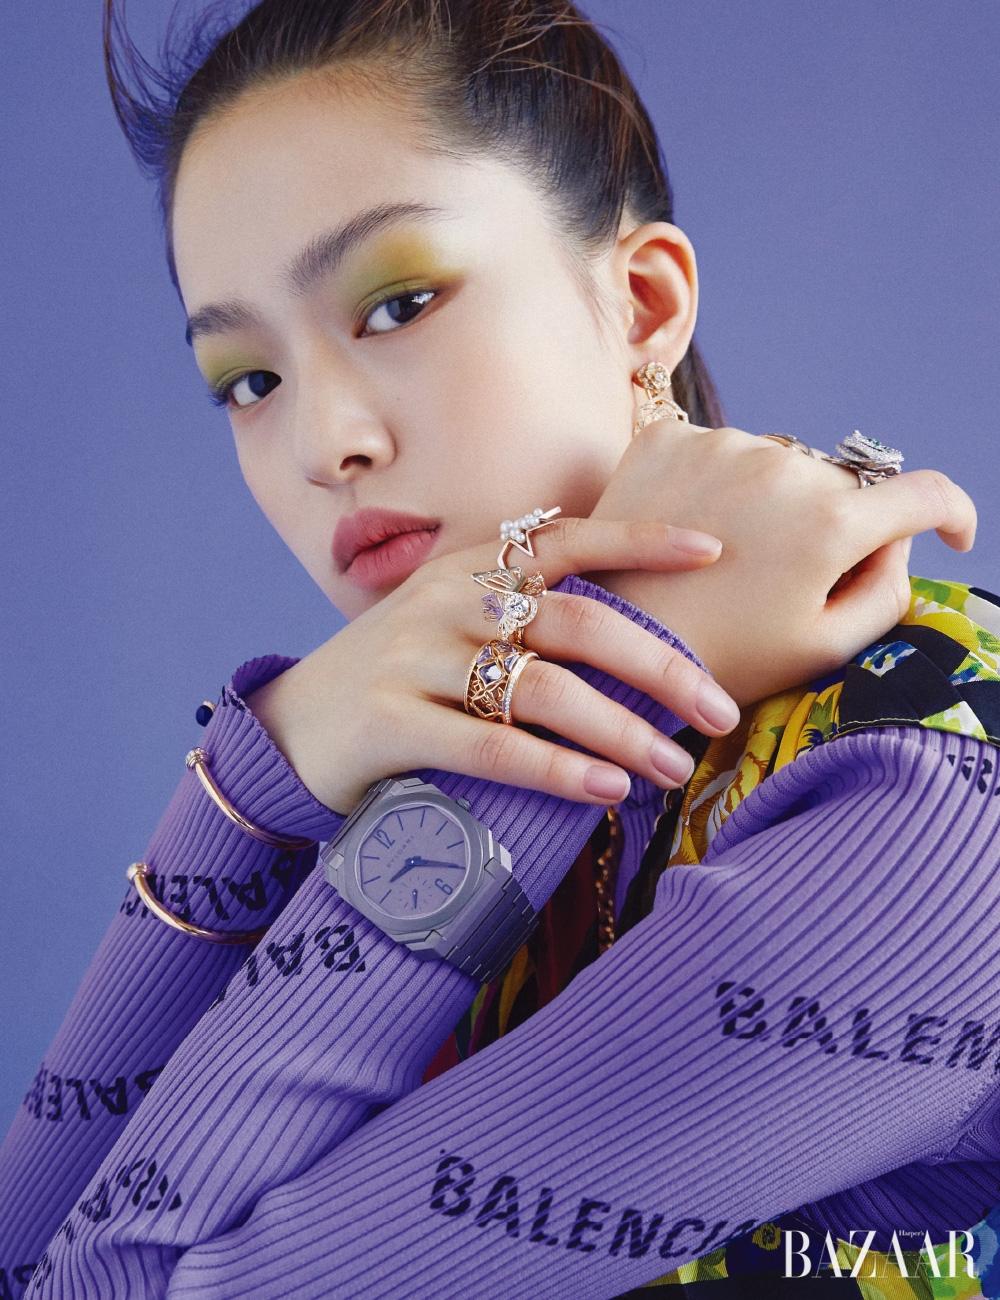 18K 핑크 골드에 브릴리언트 컷 다이아몬드를 세팅한 귀고리는 4천2백40만원 Piaget, 오른손 검지에 착용한 사쿠라 골드와 담수 진주가 세팅된 반지는 Tasaki, 나비 모티프 반지는 2천6백만원대 Lucie, 로즈 골드와 자수정이 조화로운 반지는 Chopard, 라피스 라줄리 카보숑과 커닐리언 카보숑 장식의 오픈 팔찌는 각각 7백만원대, 8백만원대 모두 Piaget, 왼손 중지에 착용한 화이트 골드와 다이아몬드, 차보라이트 가닛, 에메랄드가 장식된 반지는 Dior Fine Jewelry, 0.46캐럿의 라운드 컷 다이아몬드가 세팅된 베이지 골드 반지는 Chanel Fine Jewelry, '옥토 피니씨모 오토매틱' 시계는 1천7백만원대 Bvlgari, 원피스, 톱은 모두 Balenciaga.